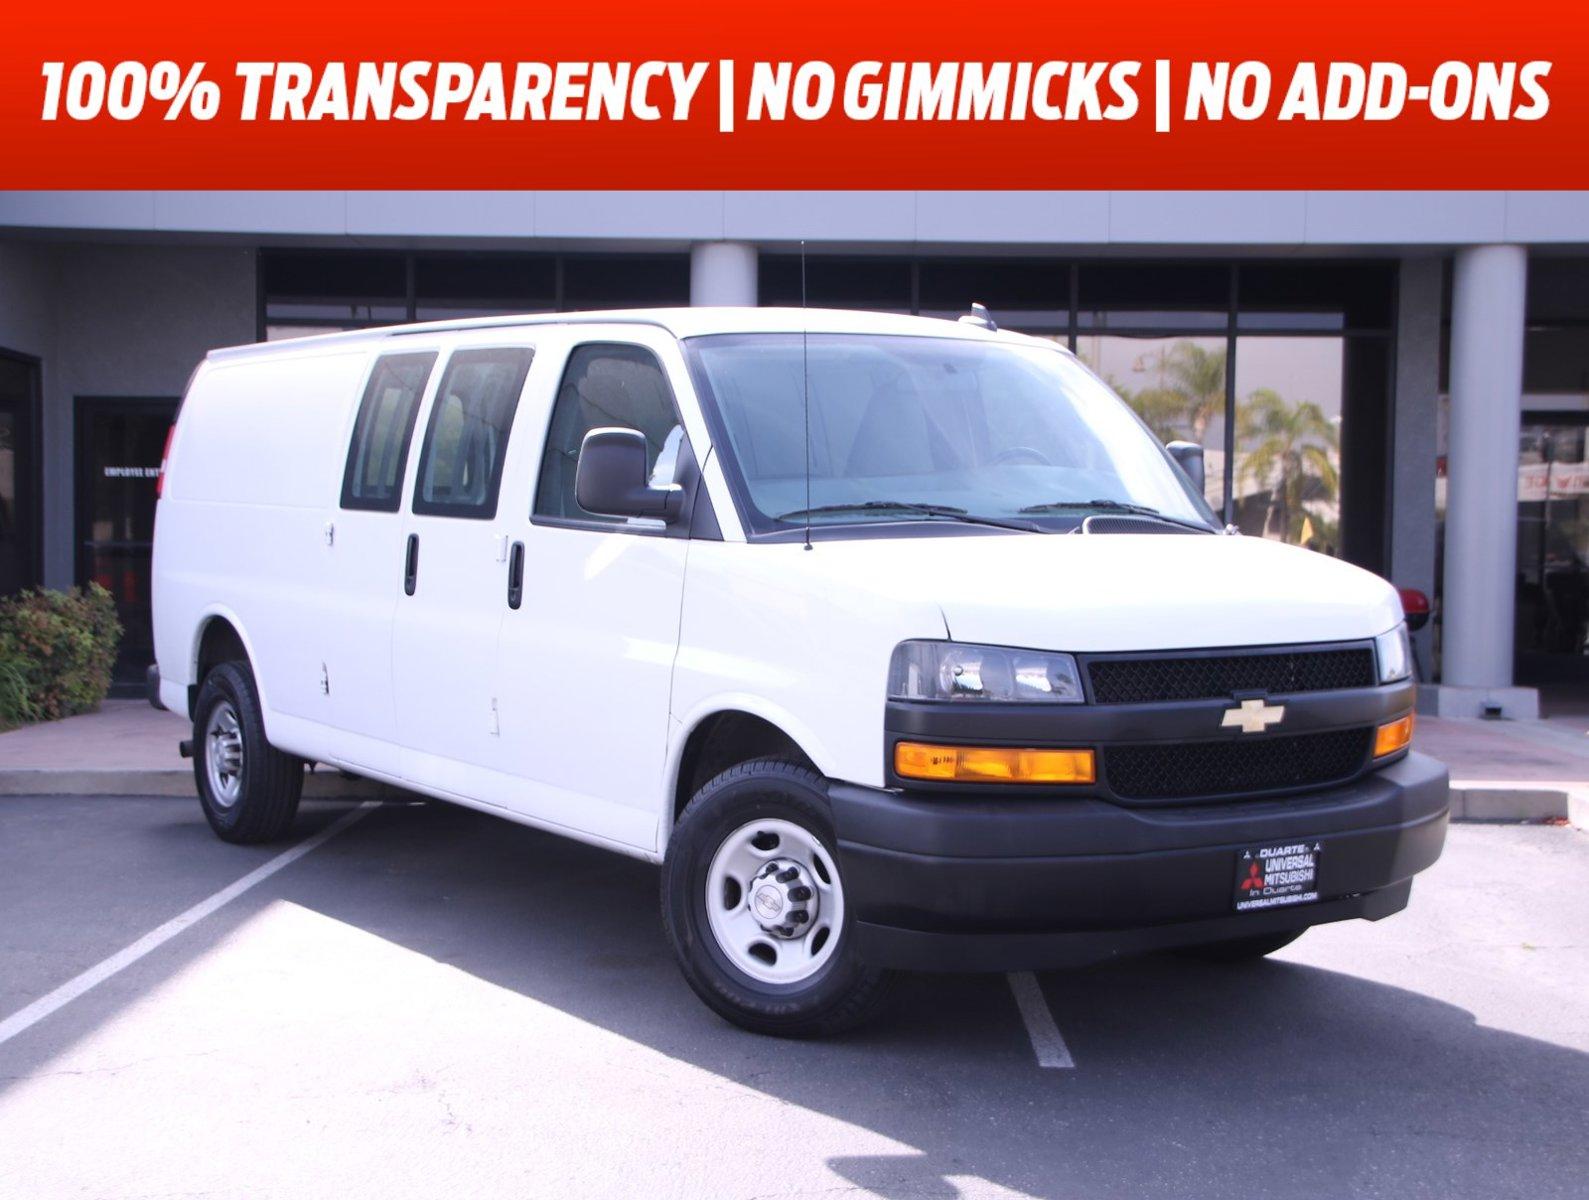 "2020 Chevrolet Express Cargo Van RWD 2500 155"" Gas/Ethanol V8 6.0L/364 [3]"